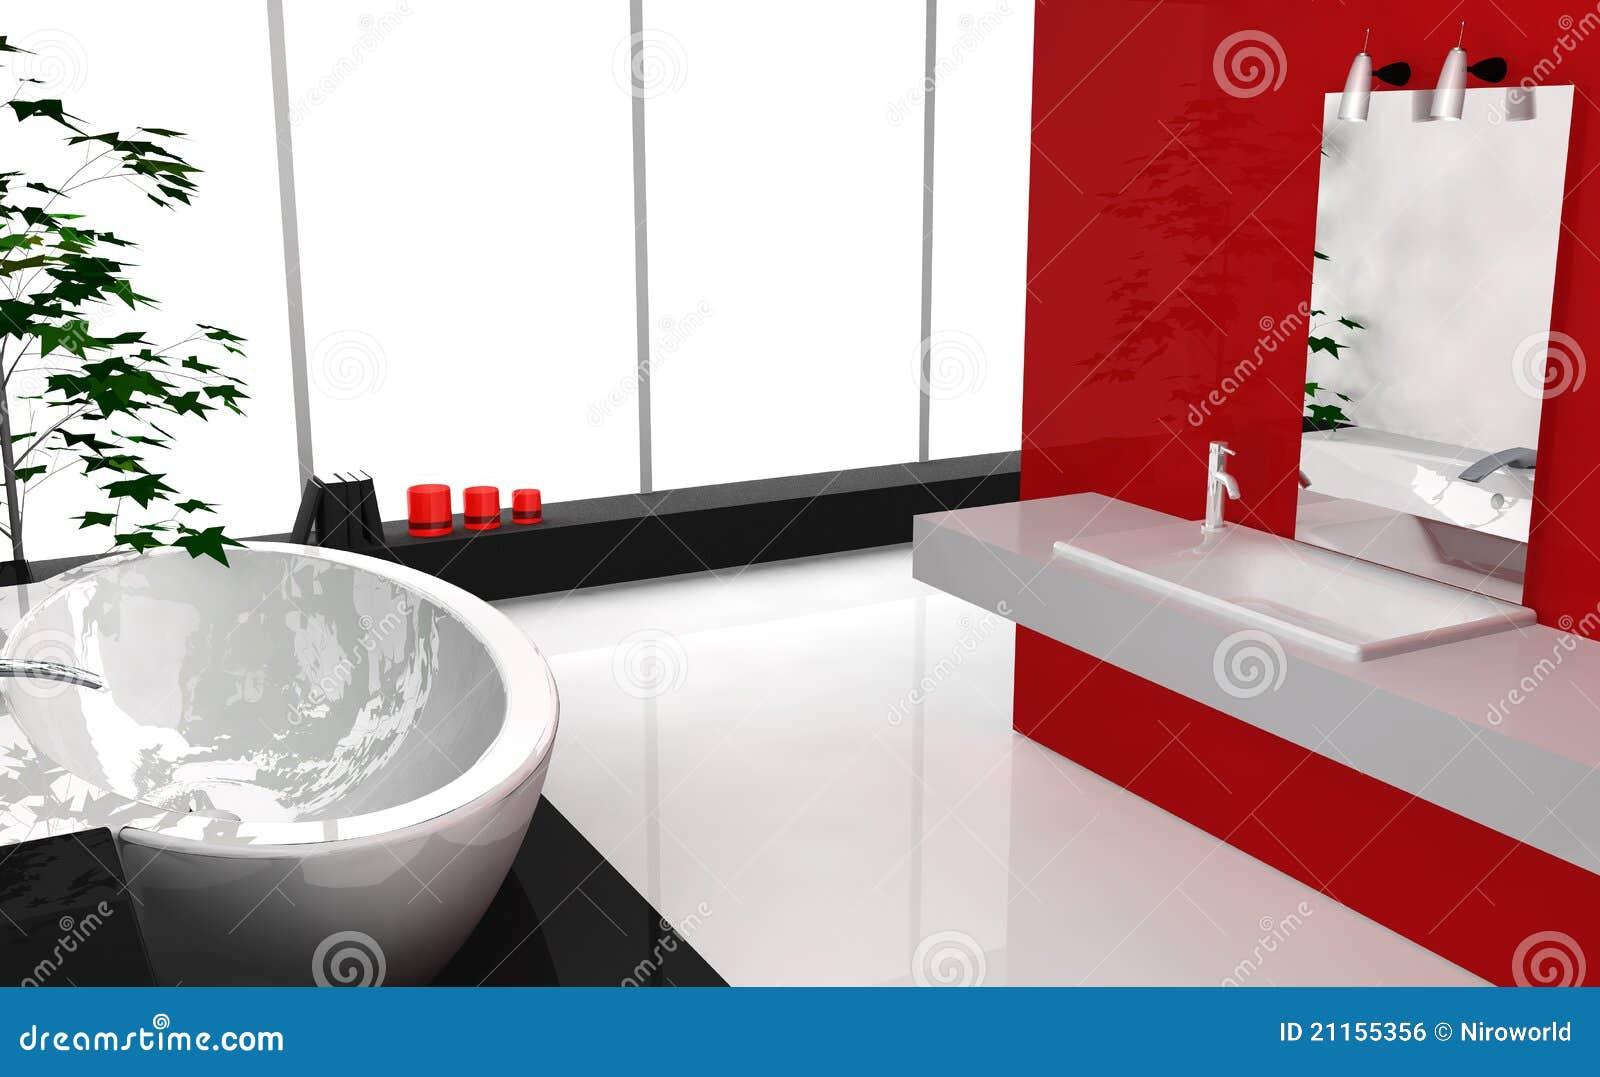 Cuarto de ba o de lujo moderno imagen de archivo libre de - Cuarto de bano moderno ...